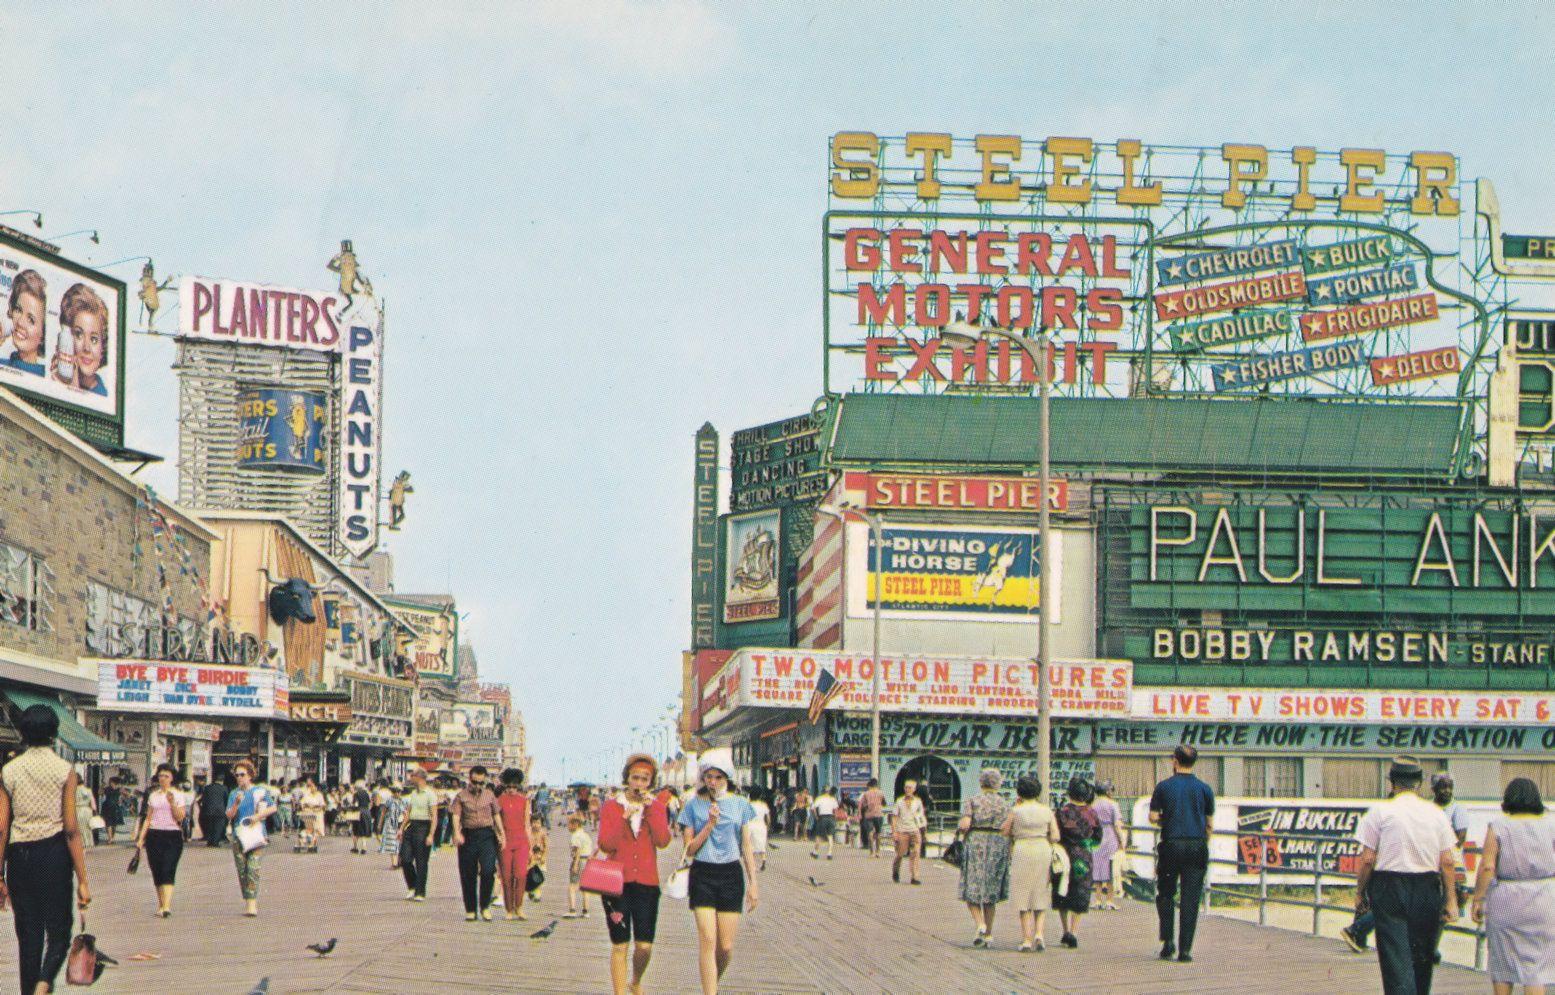 Paul Anka Live at Broadwalk Steel Pier ****** Van ****** USA Postcard /  HipPostcard